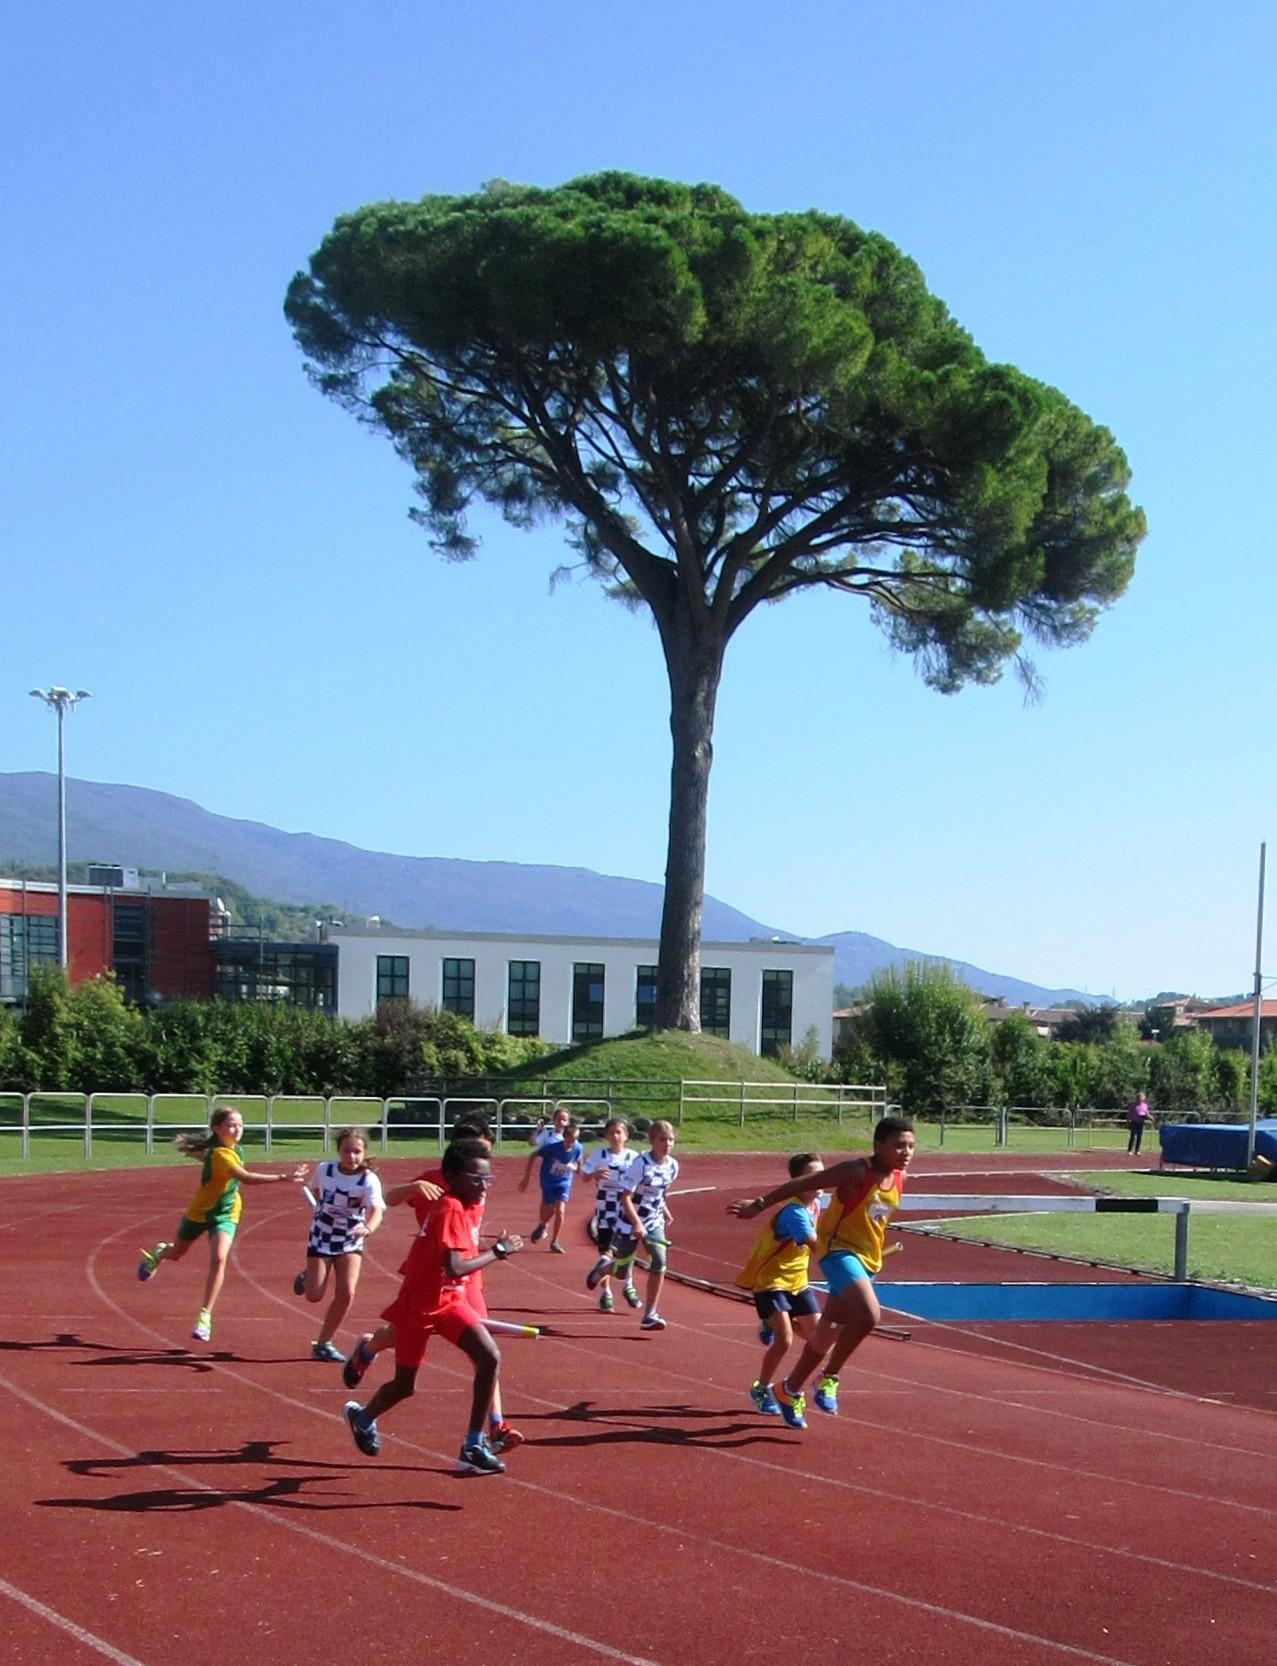 vittorio-veneto_la-pista-durante-una-gara-giovanile.jpg